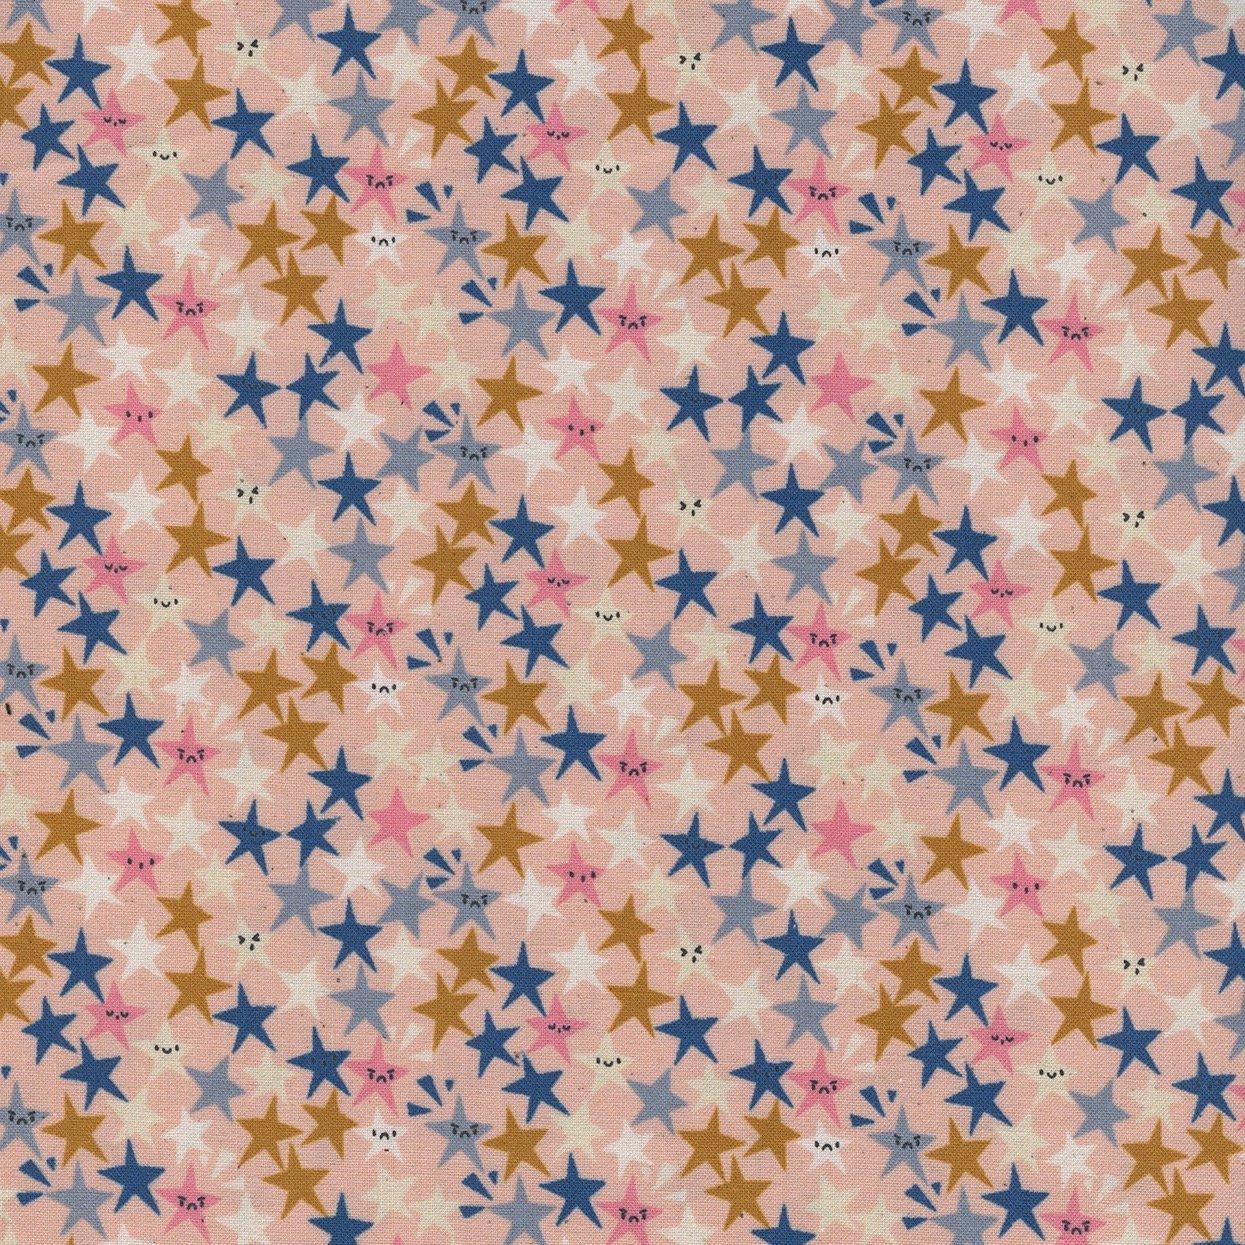 Starstruck, Peachy, Paper Cuts